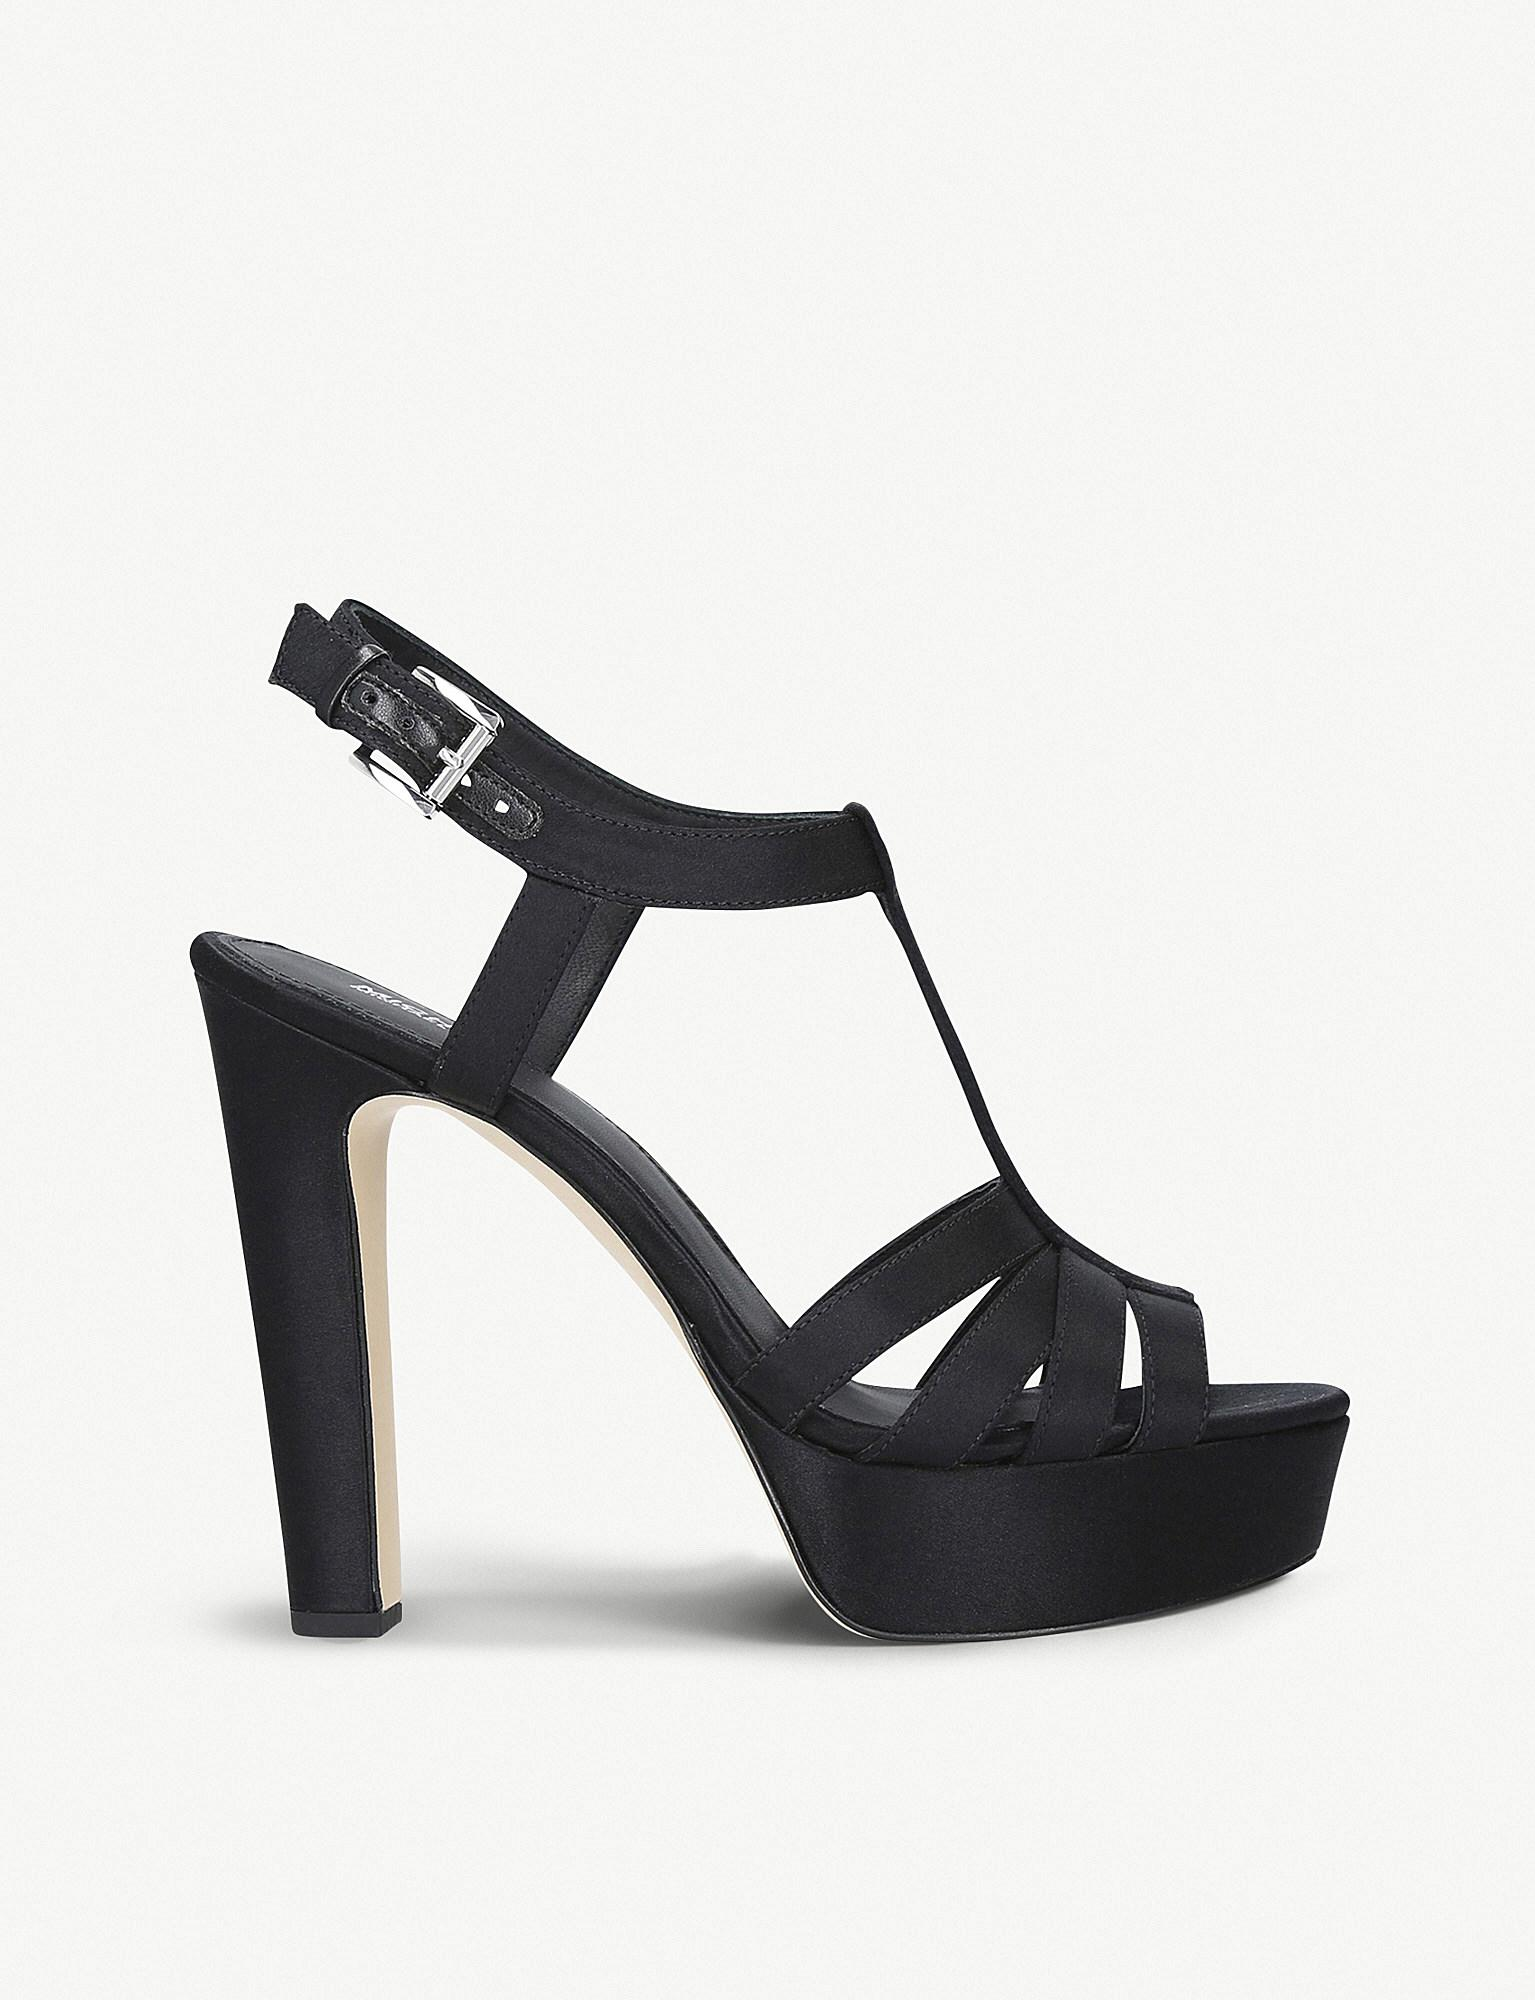 d12e672e06c Lyst - MICHAEL Michael Kors Catalina Heeled Satin Sandals in Black